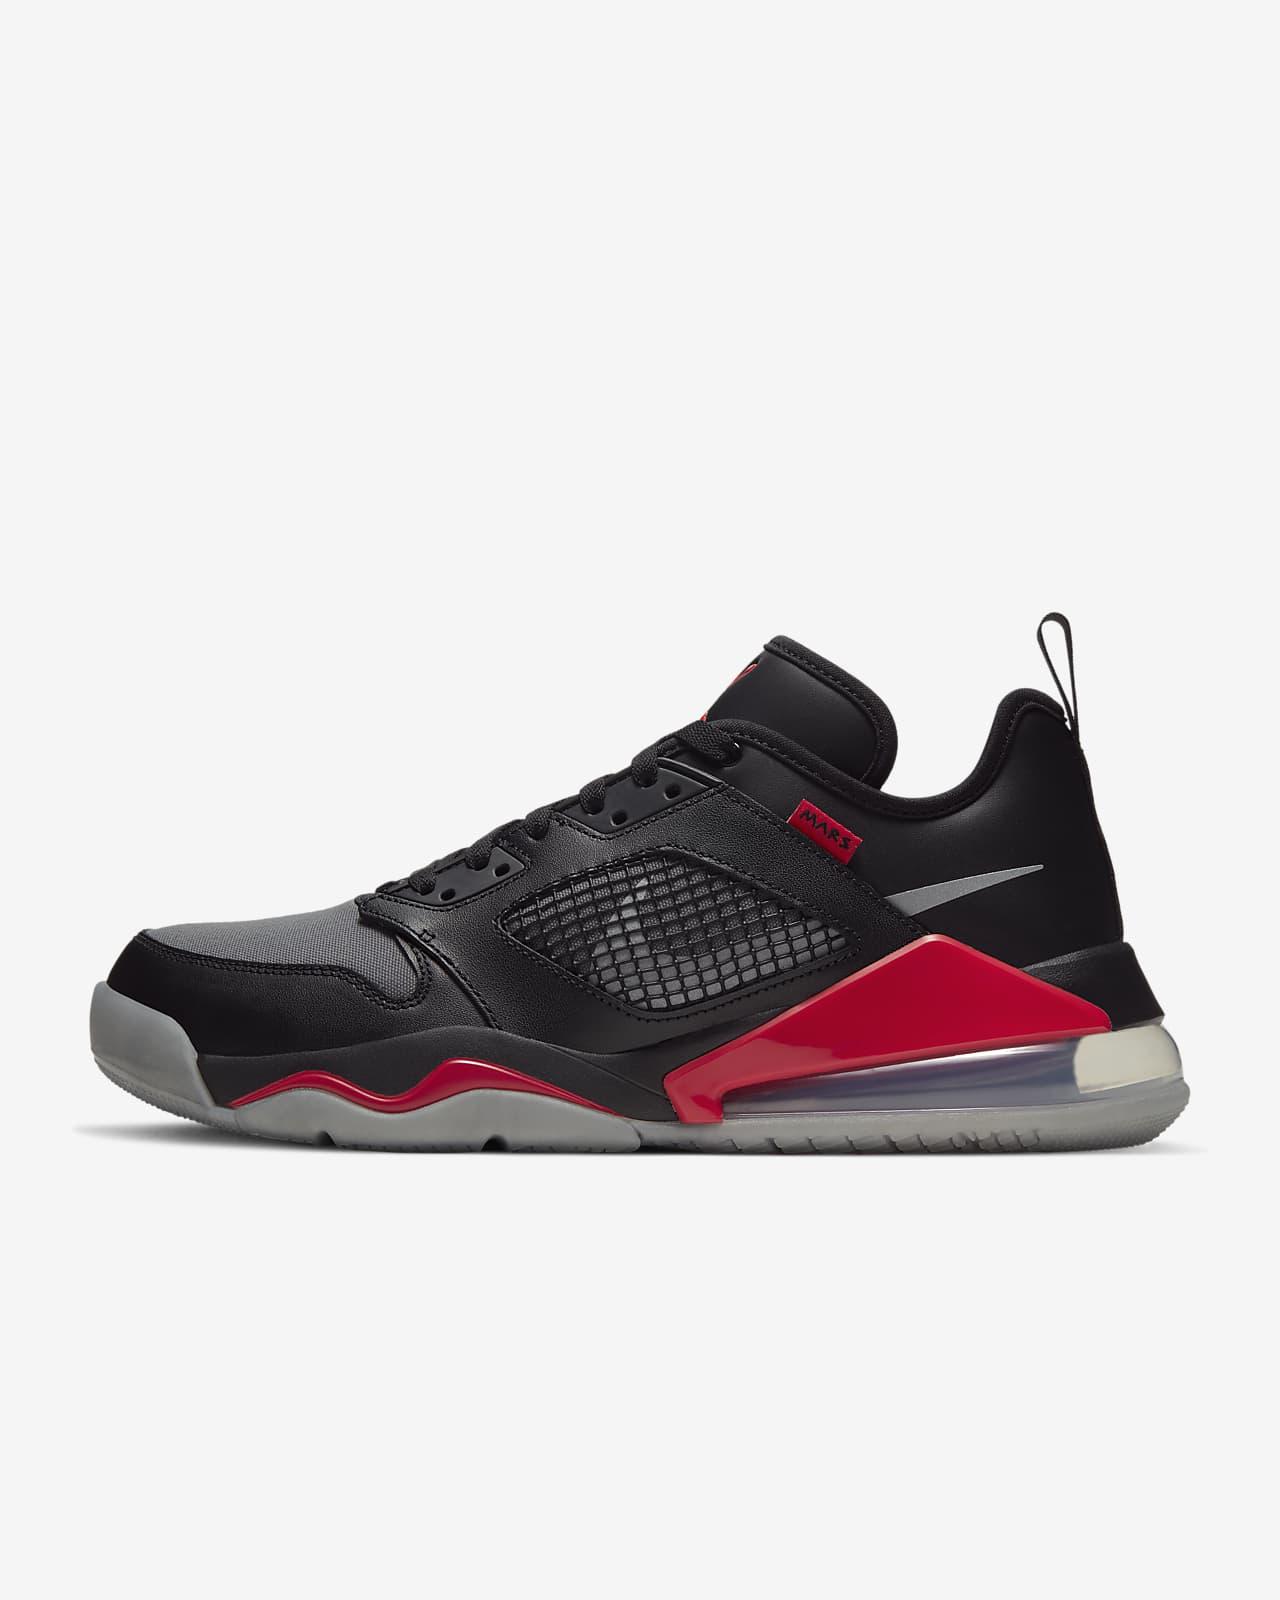 Jordan Mars 270 Low Men's Shoe